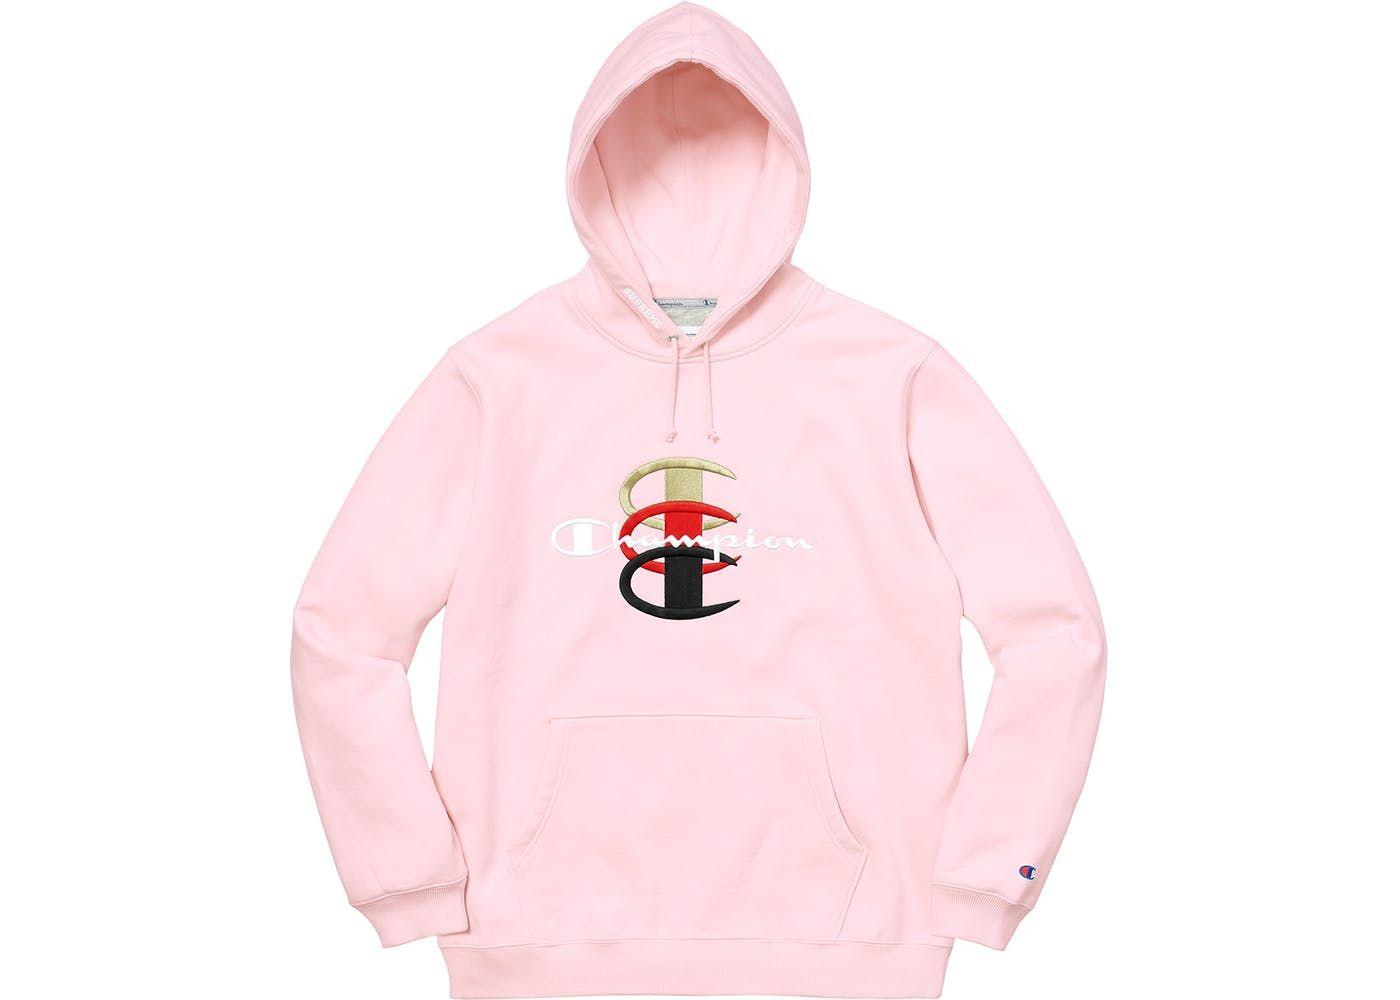 ade97255b Supreme Champion Stacked C Hooded Sweatshirt Light Pink in 2019 ...